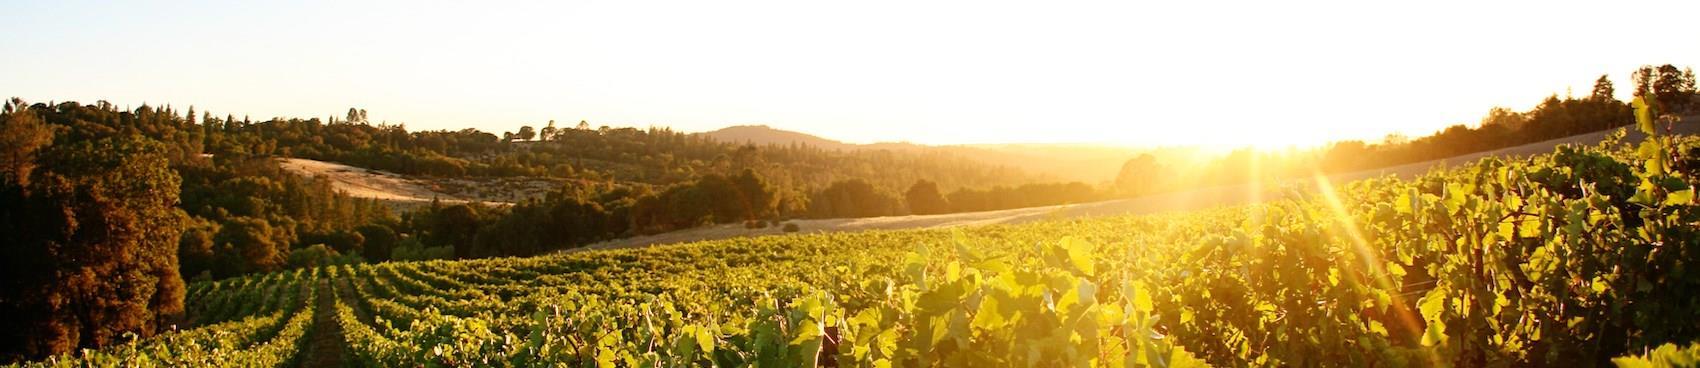 A image of Skinner Vineyards & Winery